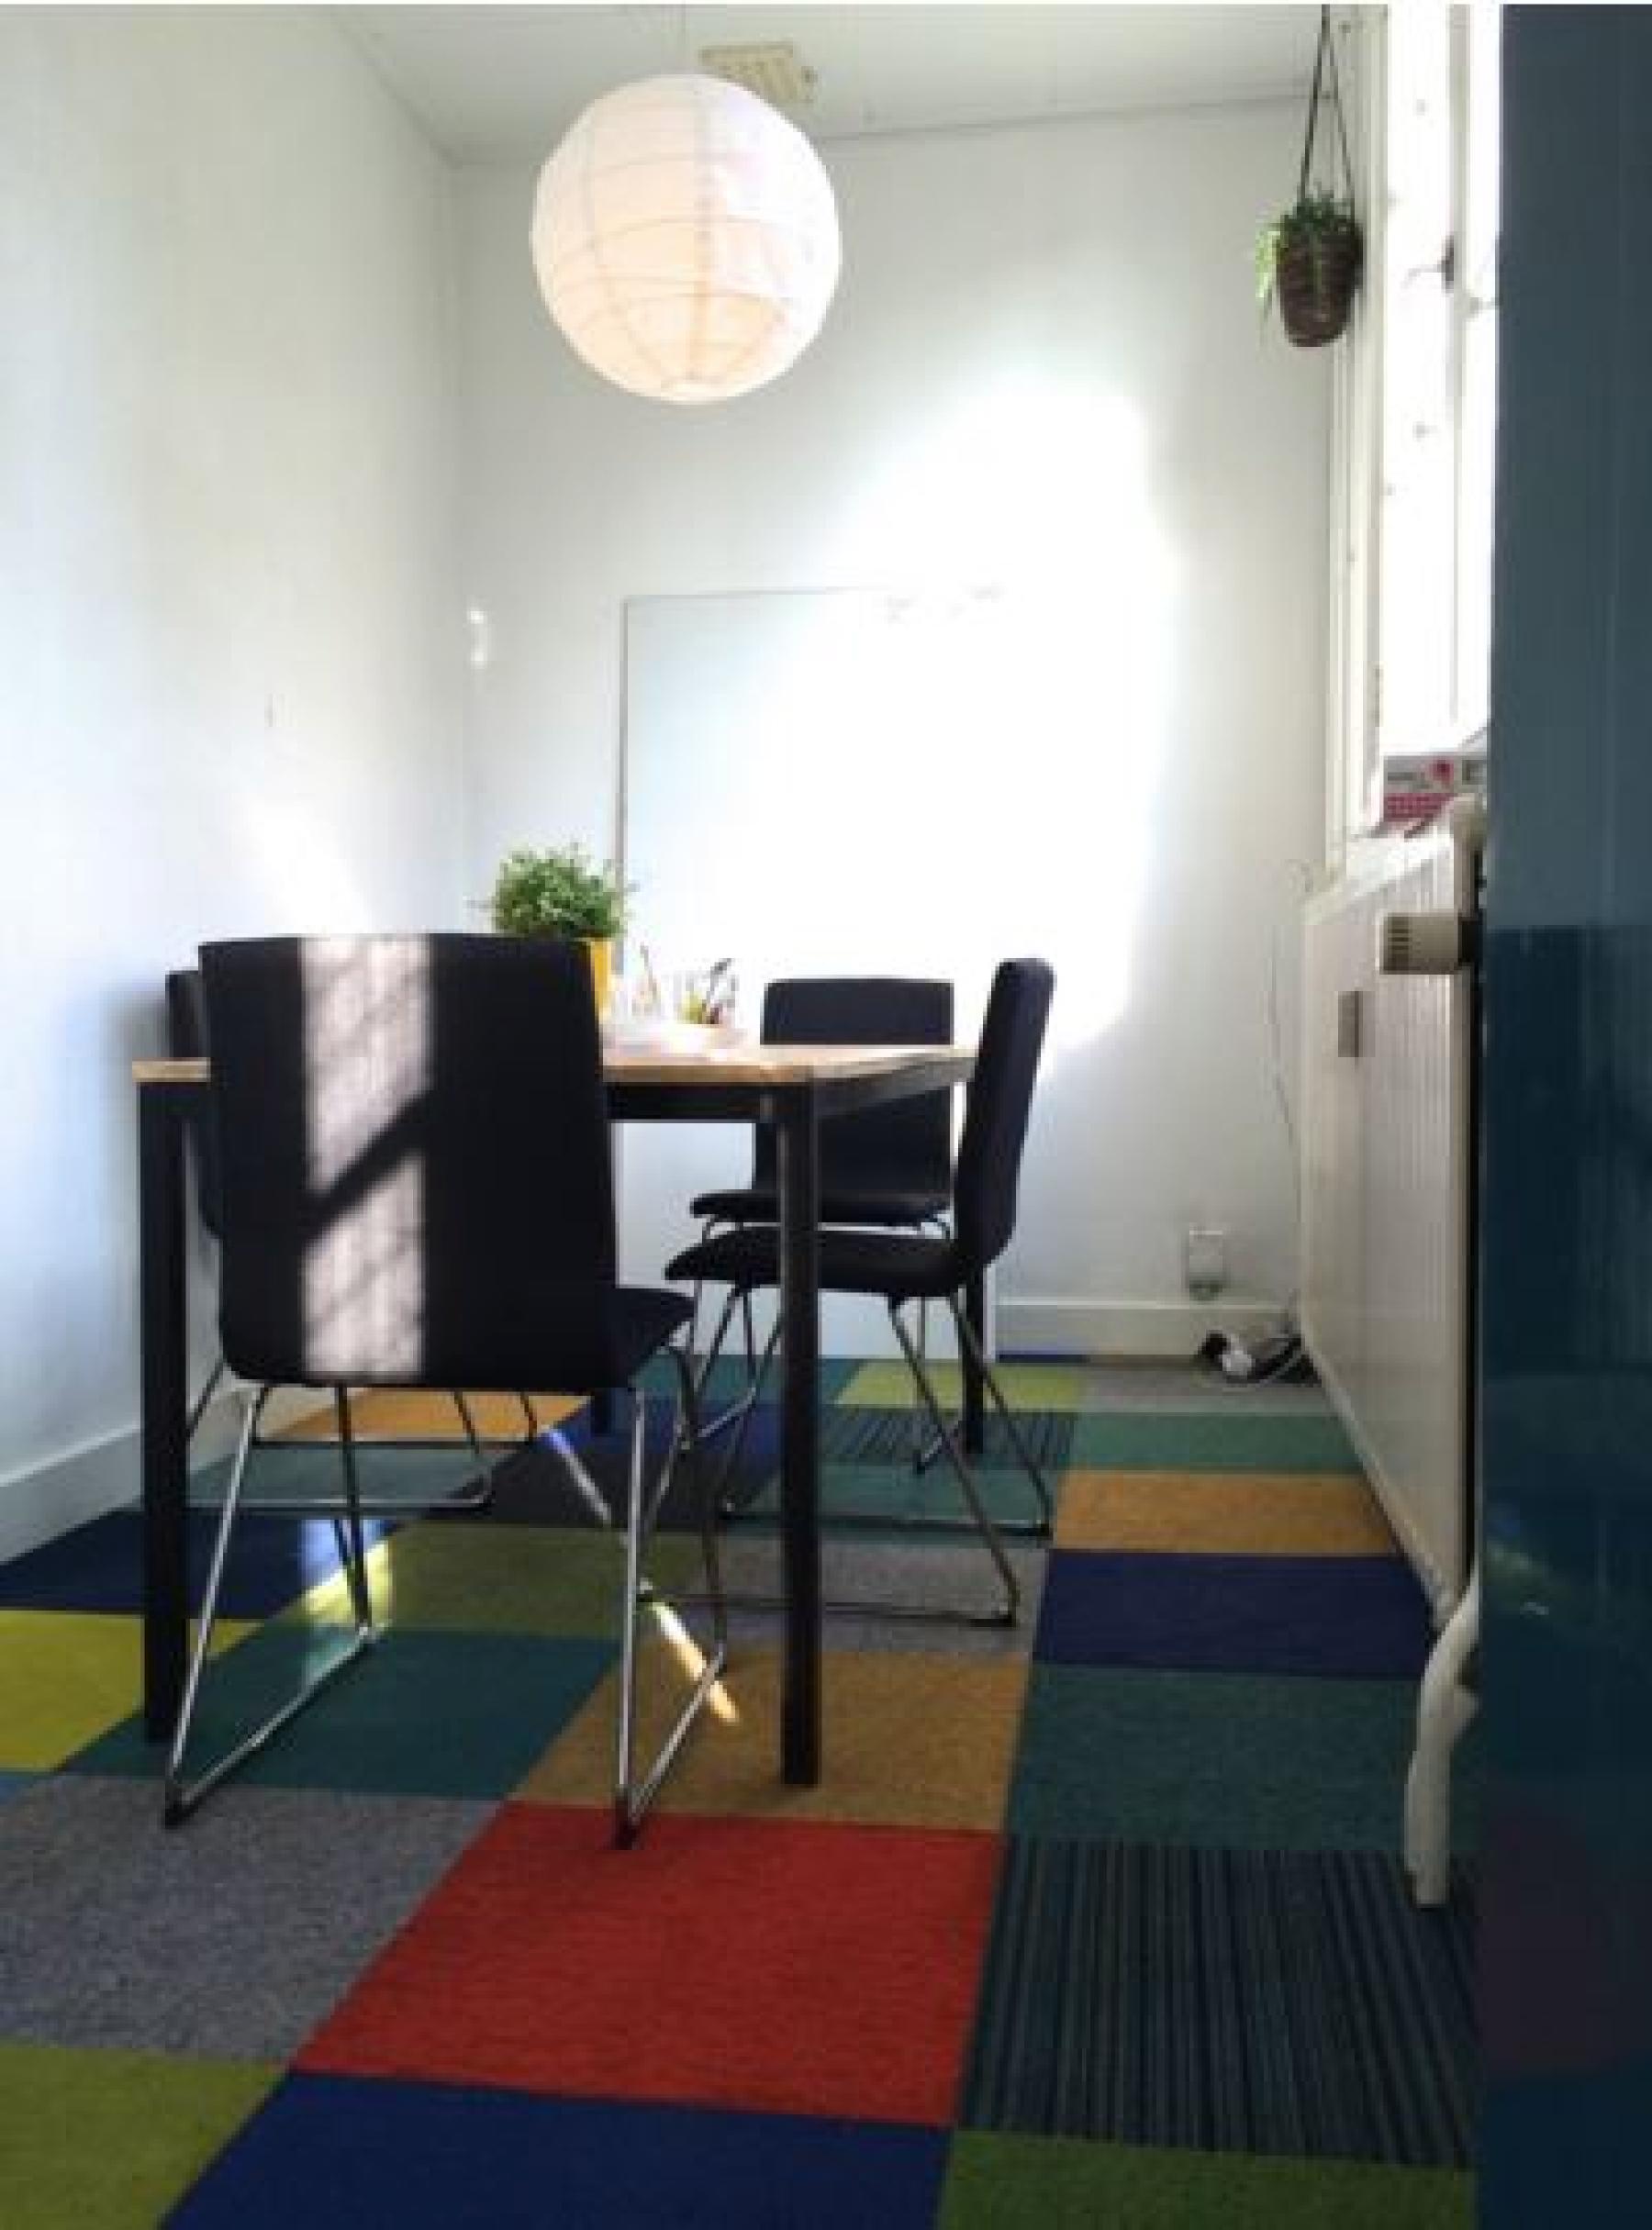 coachruimte spreekruimte vergaderruimte drie personen kantoorpand nijmegen kleurrijk gemeubileerd